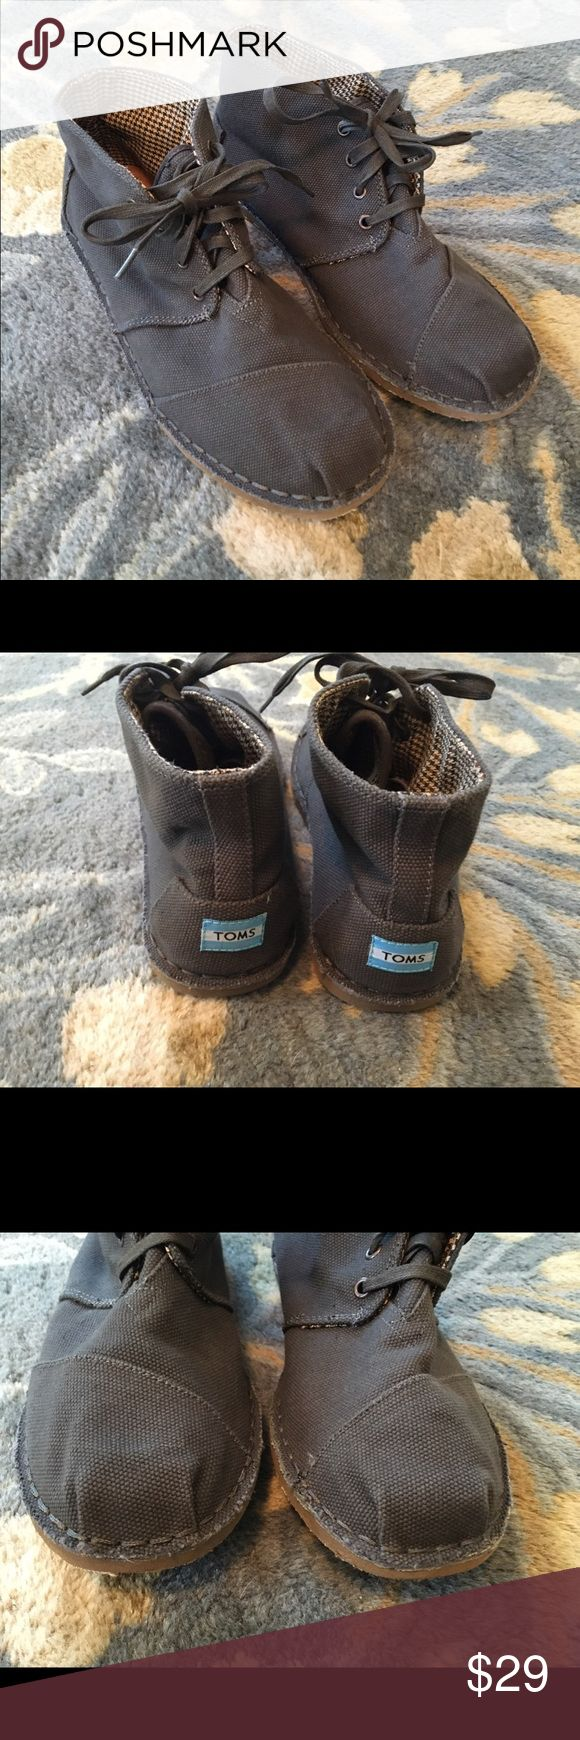 Men's Tom's Charcoal Desert Botas Sz 10 Worn a couple of times. Final price. Shoes Chukka Boots